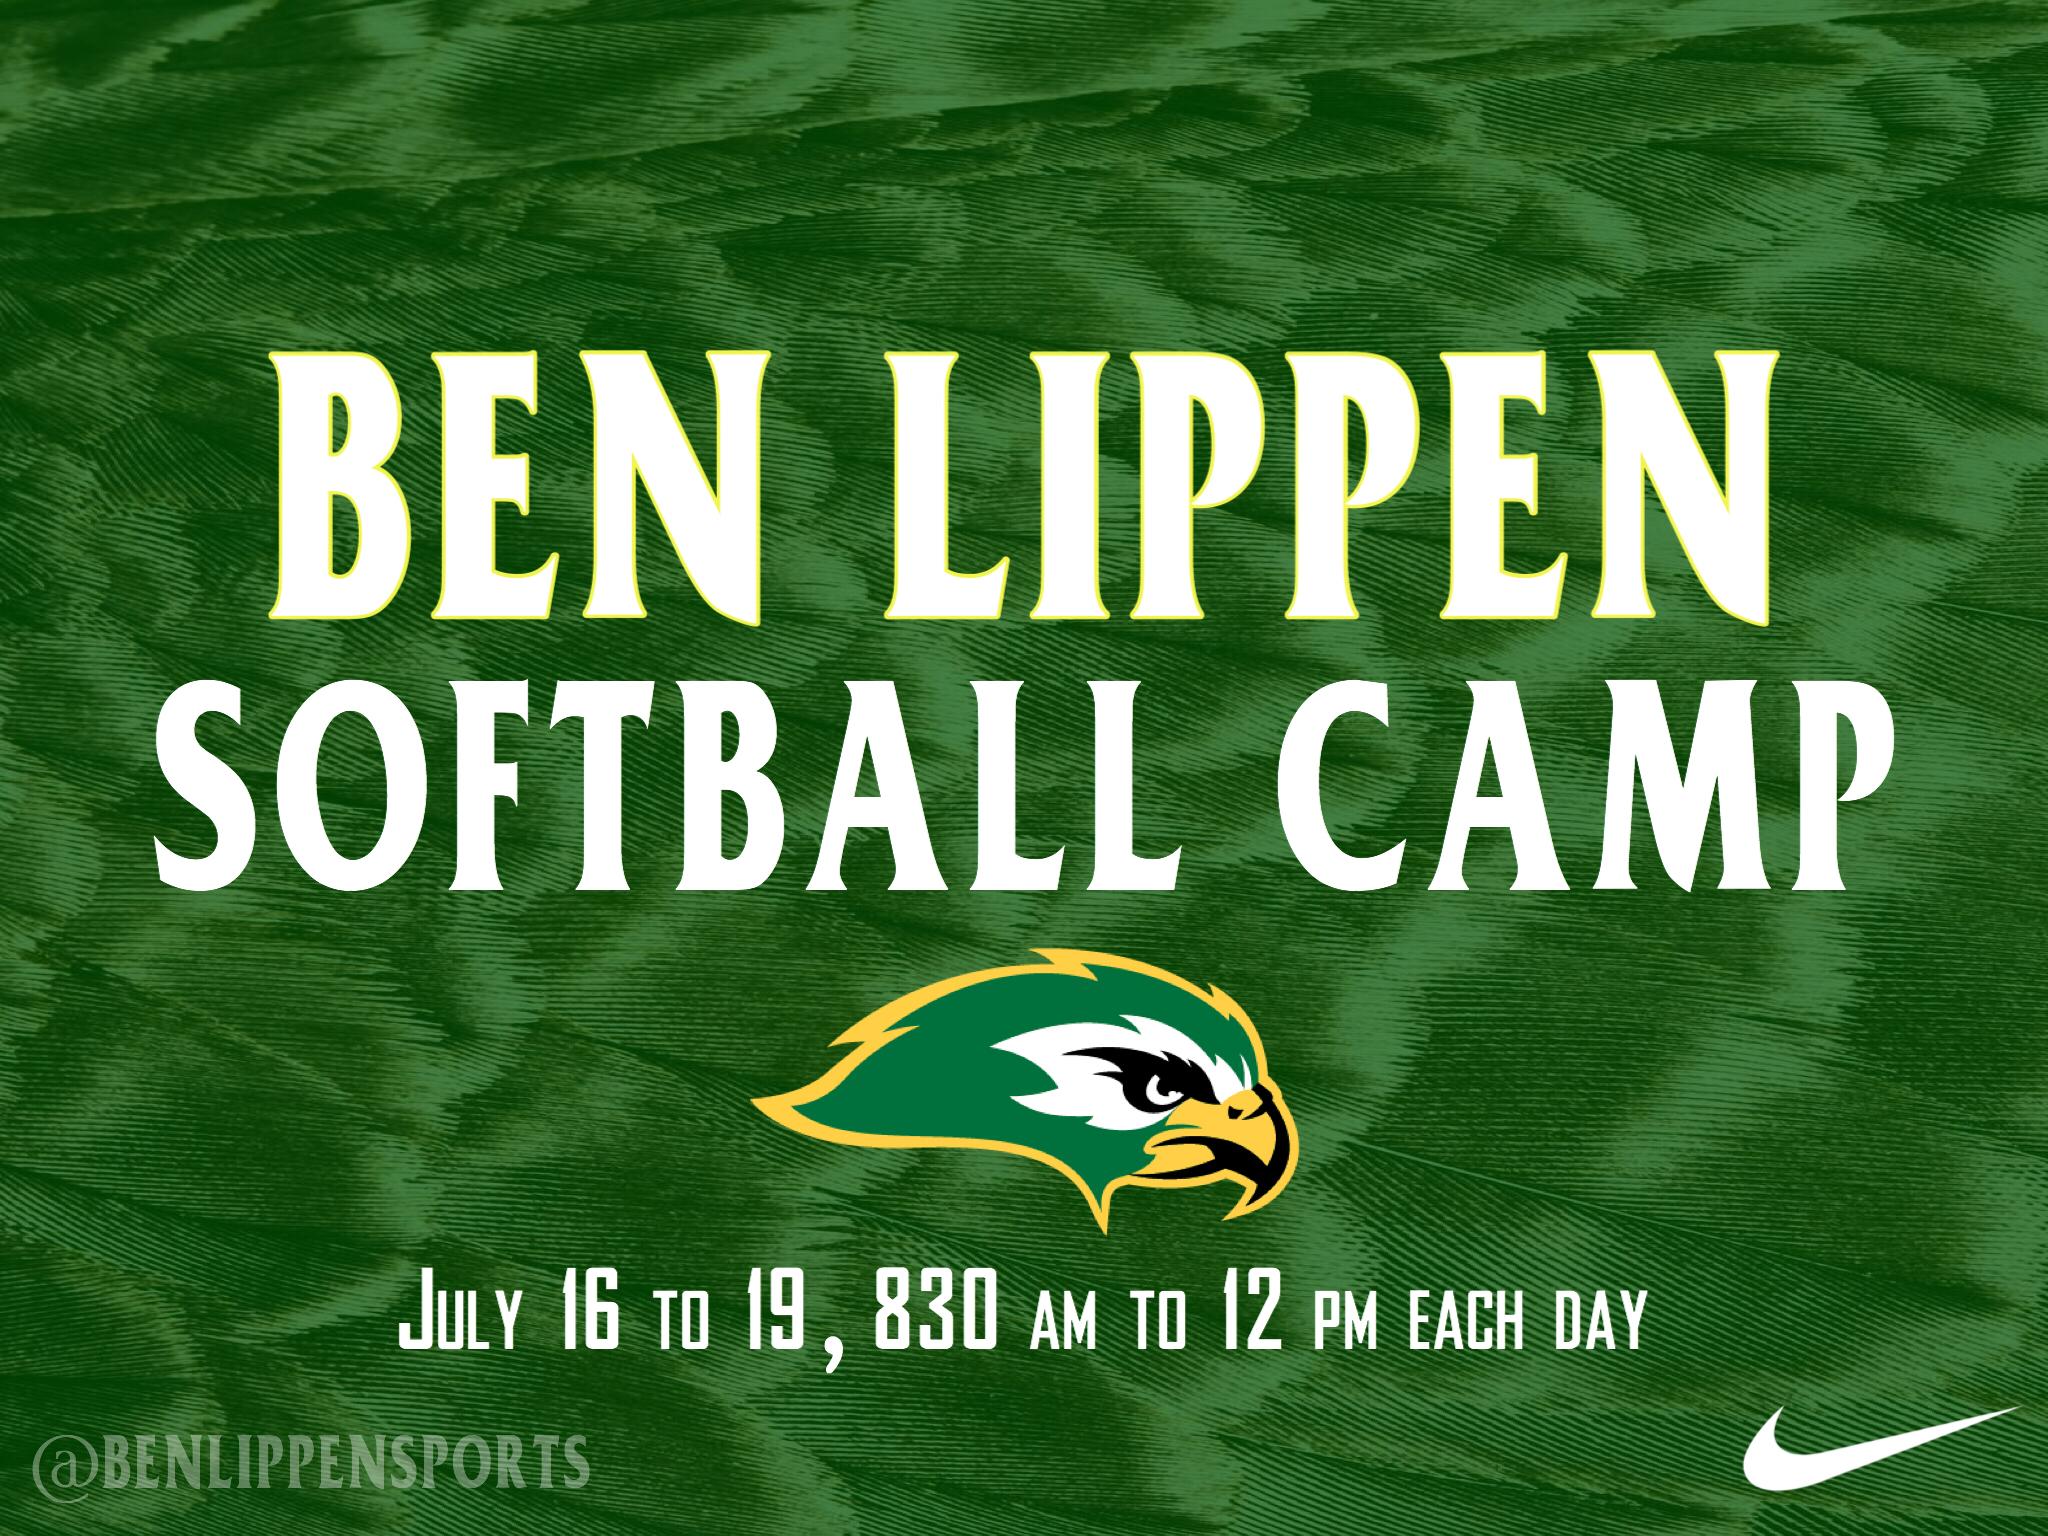 Falcons Softball Youth Camp, July 16-19